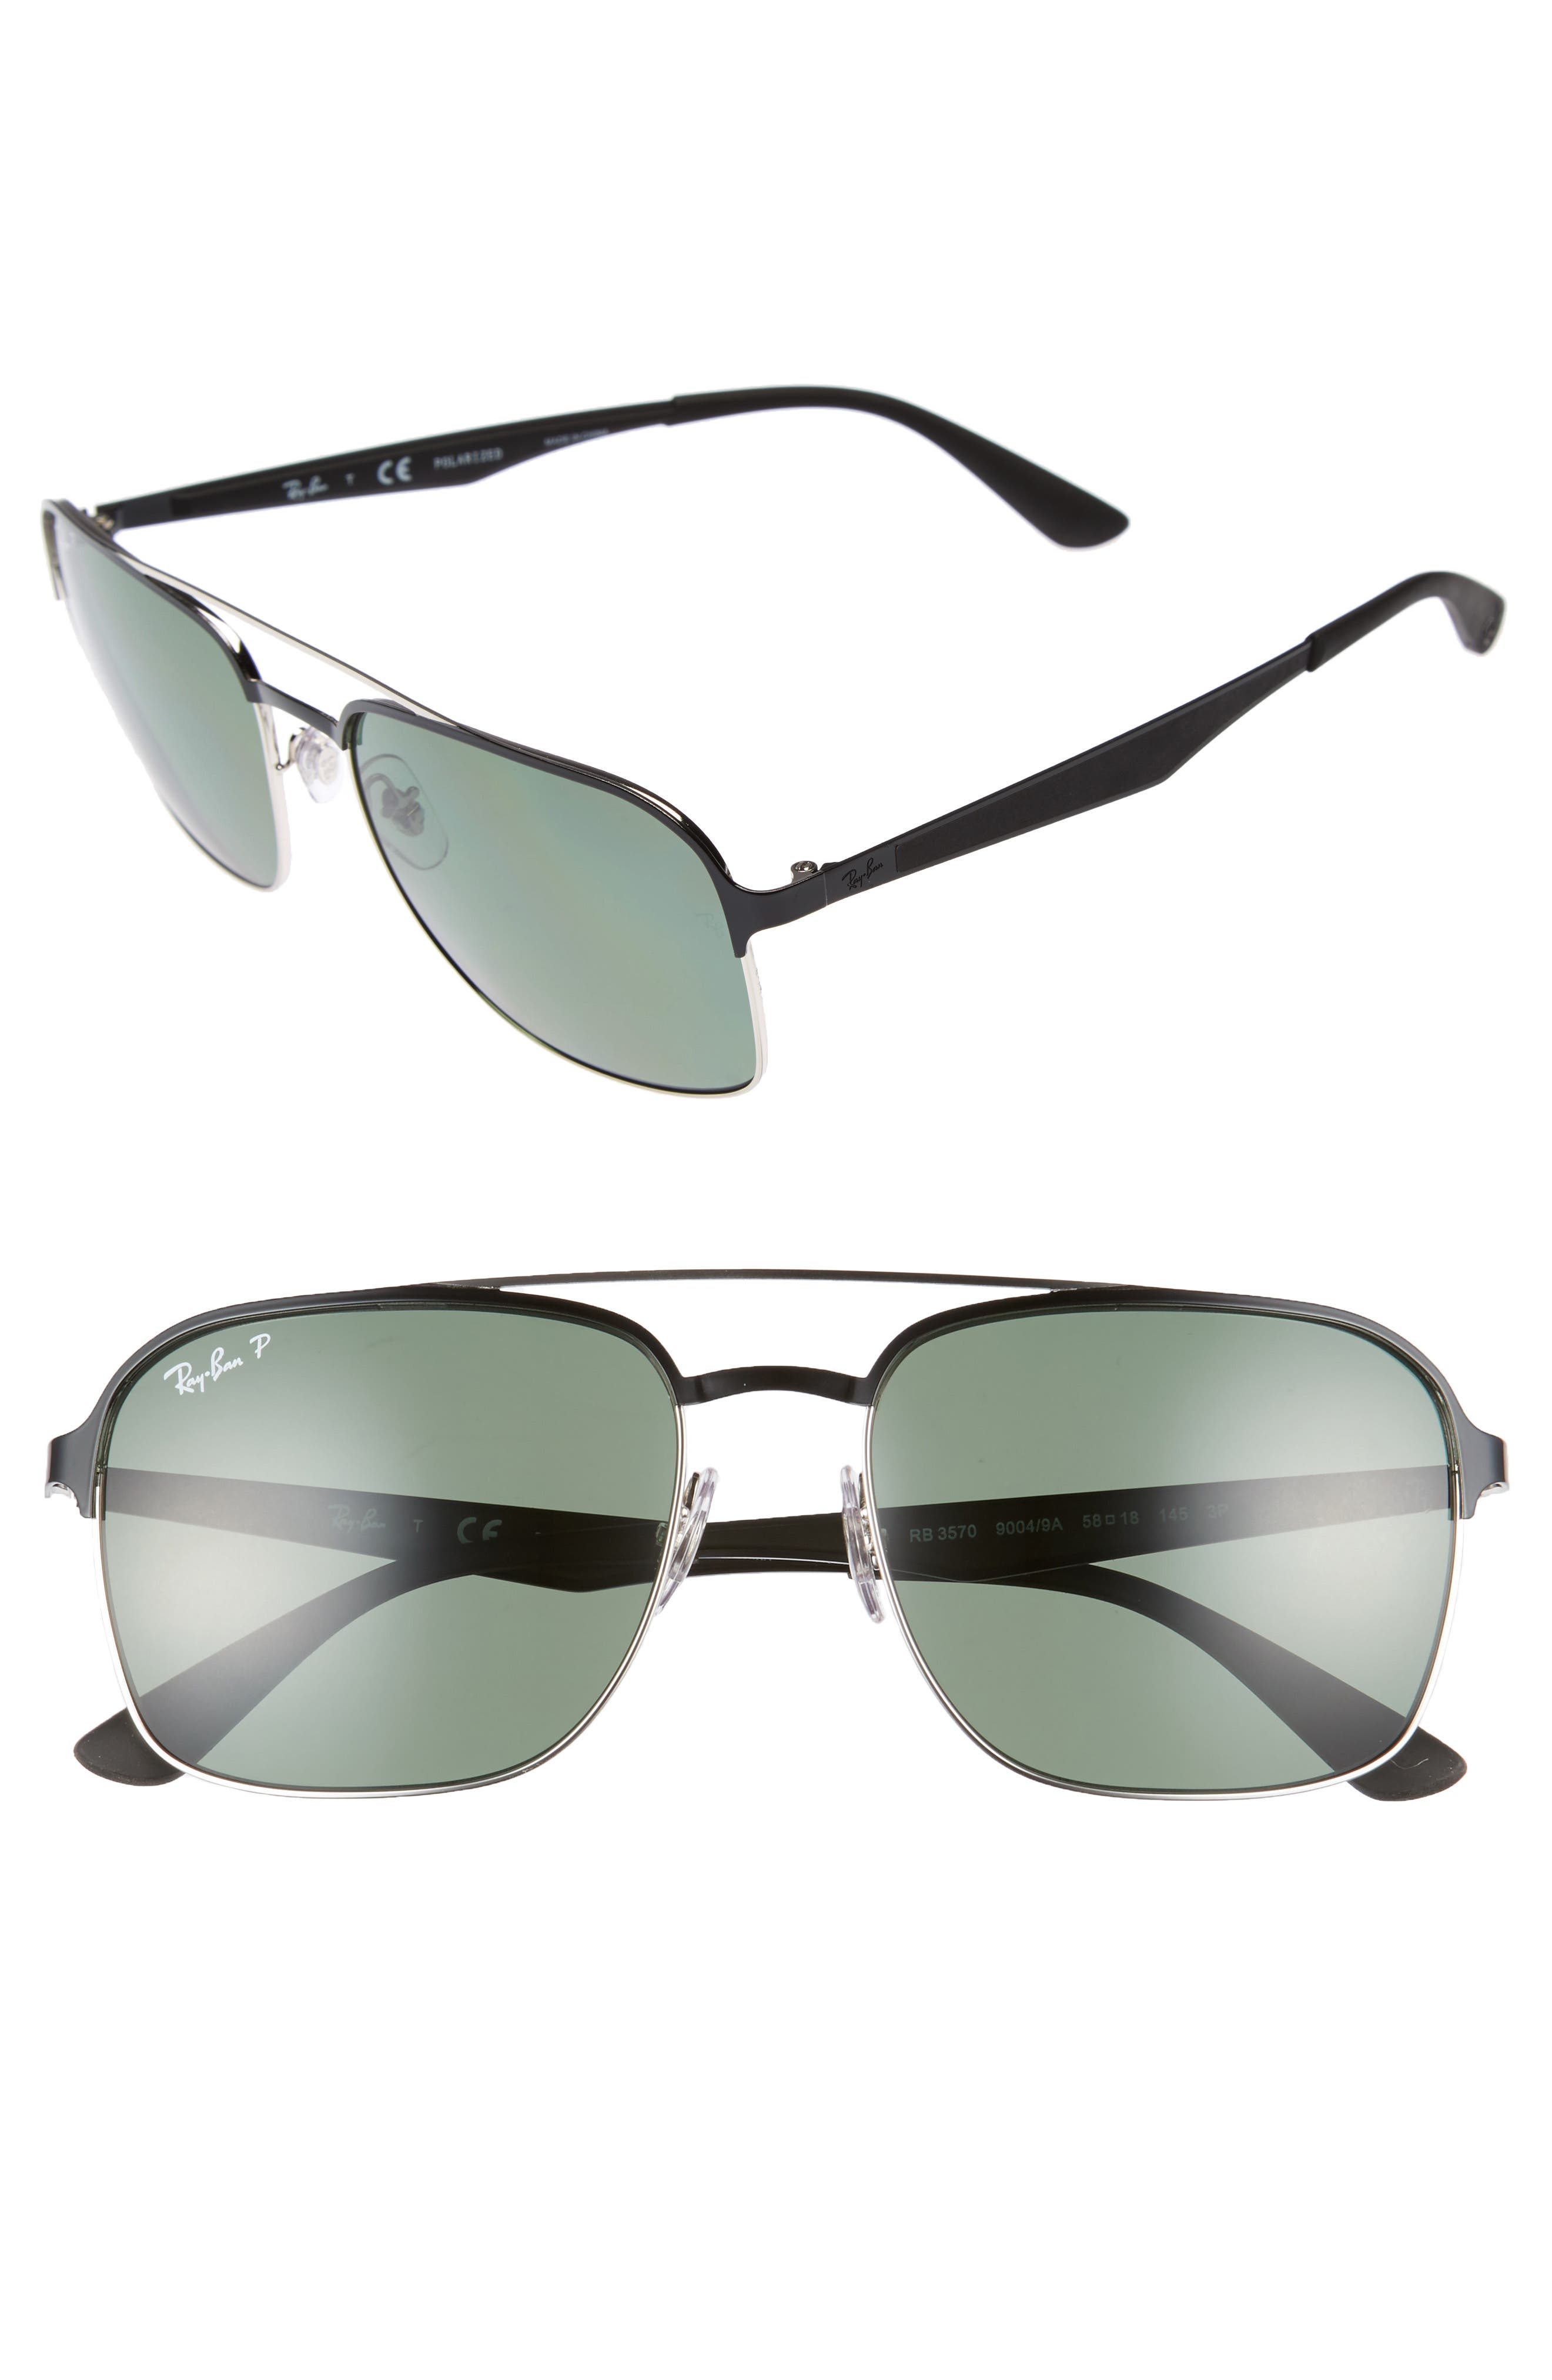 Ray-Ban 5m Polarized Sunglasses - Black Silver